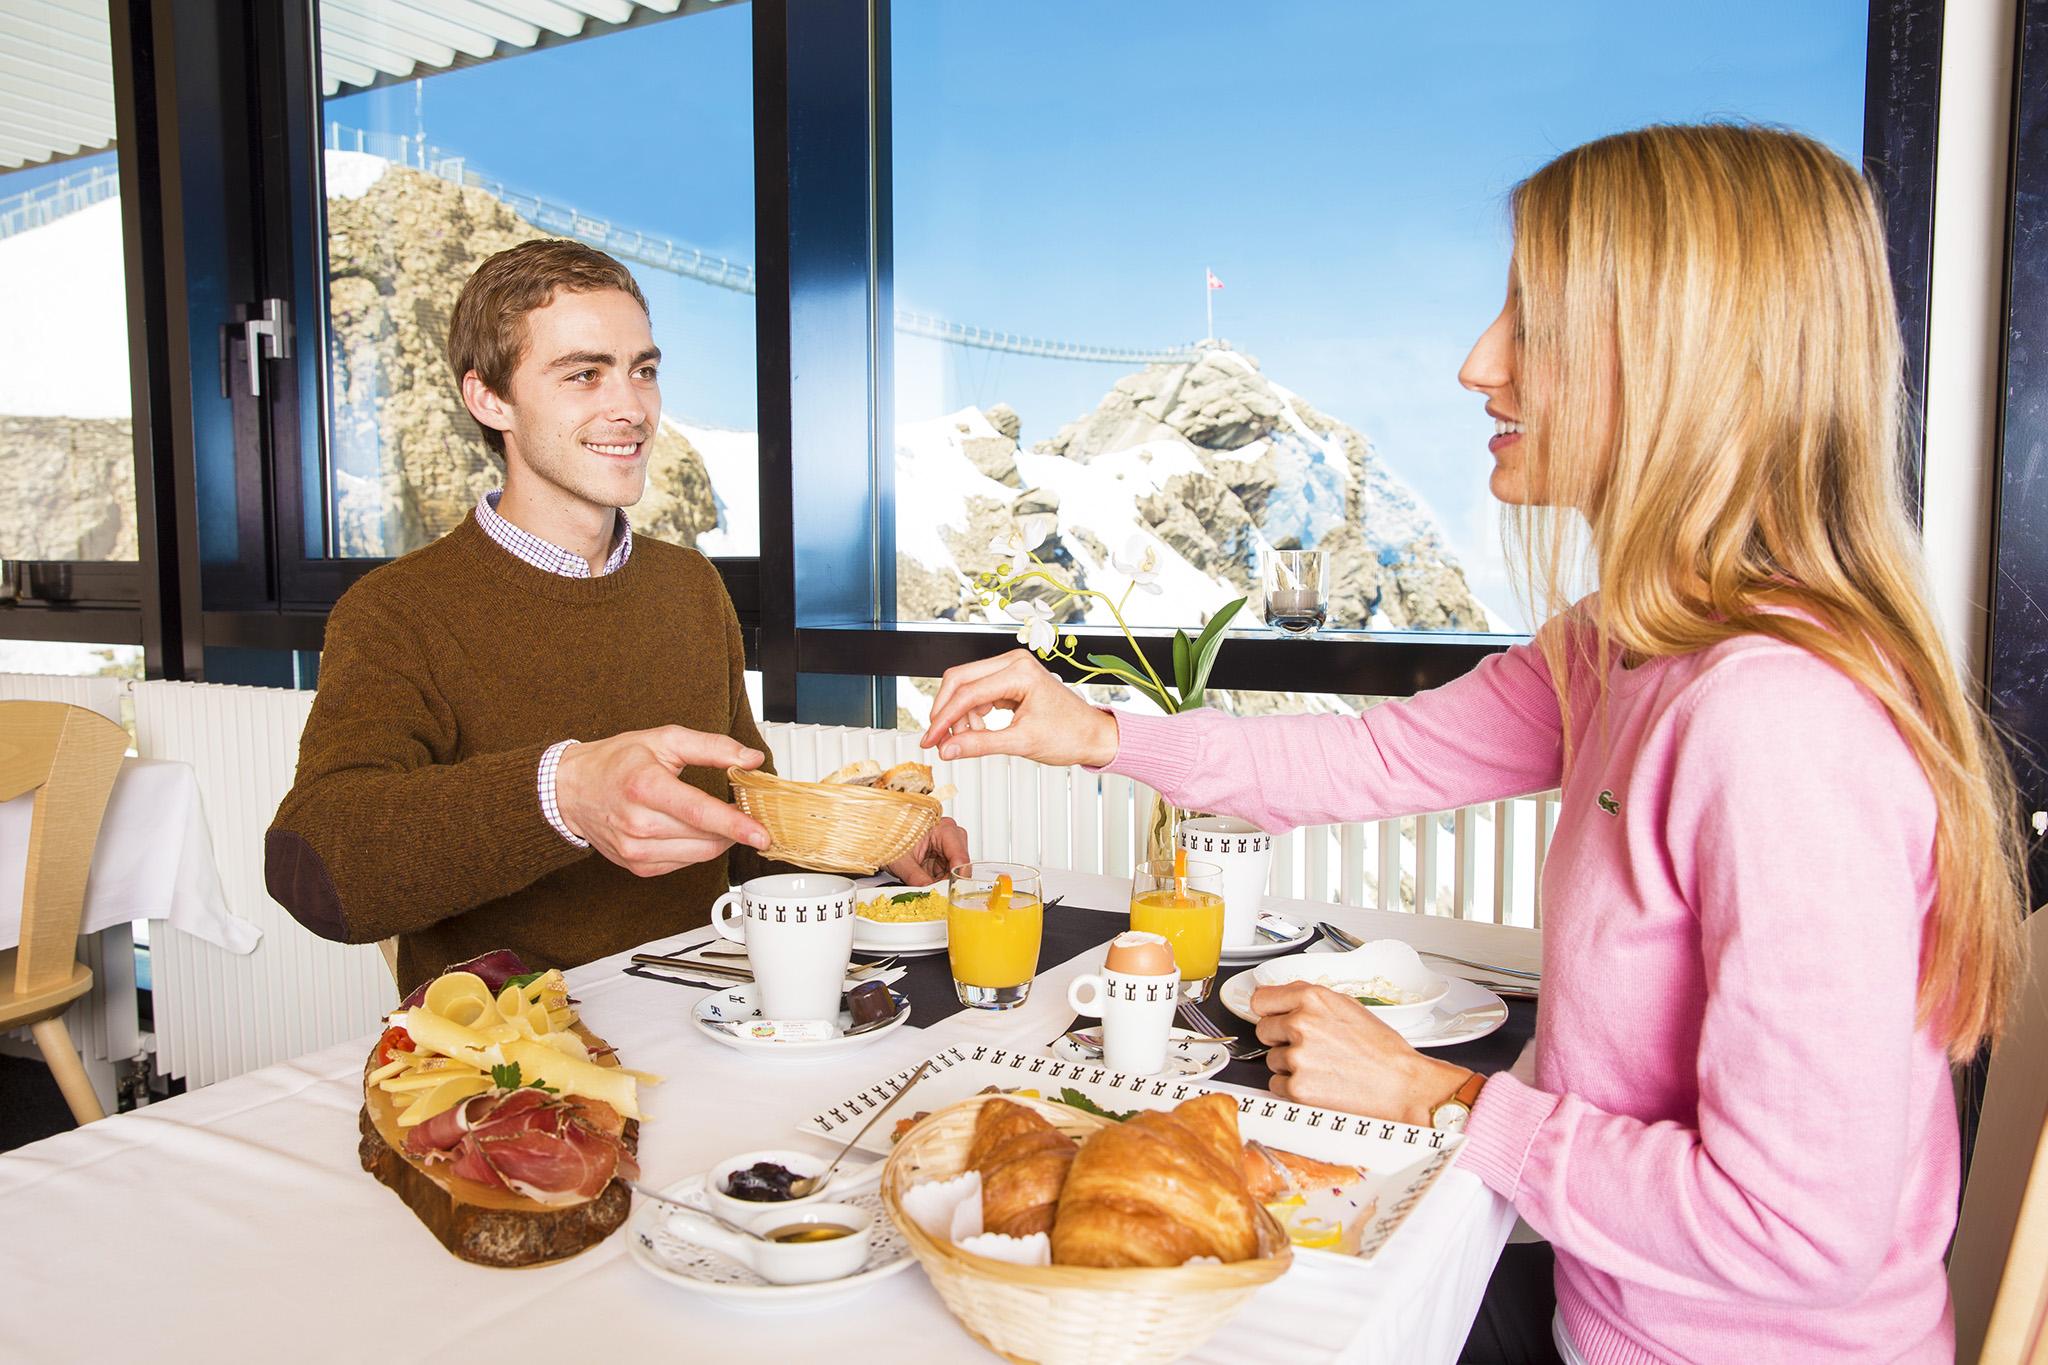 kt_2020_320_Keytours_excursions_Swisstours_glacier3000_restaurant3_2048_10